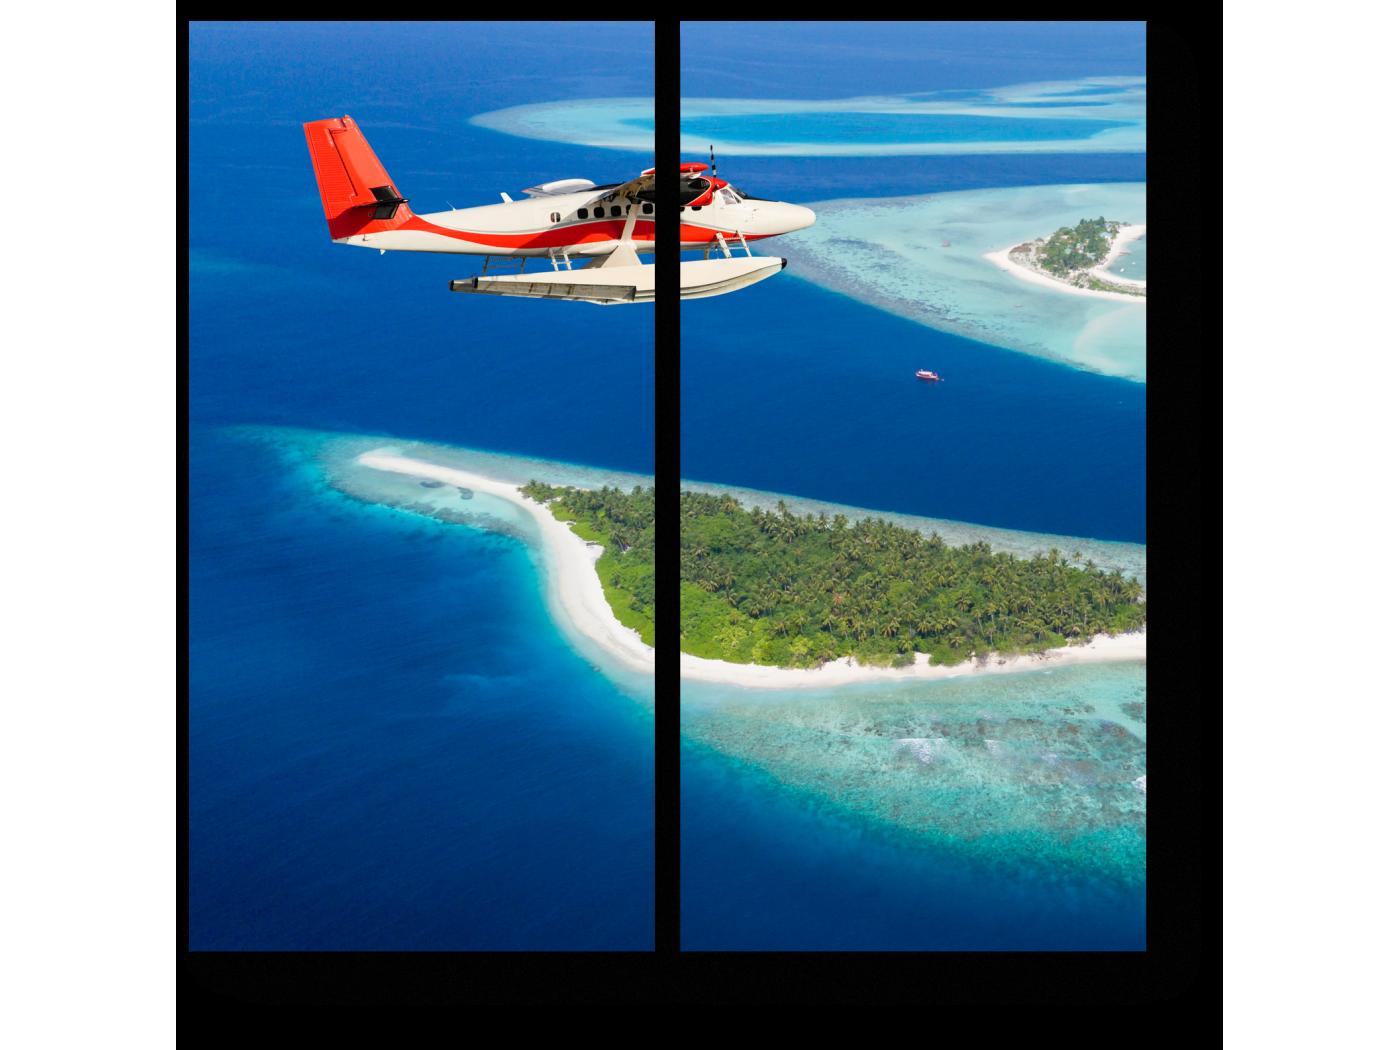 Модульная картина Летающий над Мальдивами (40x40) фото